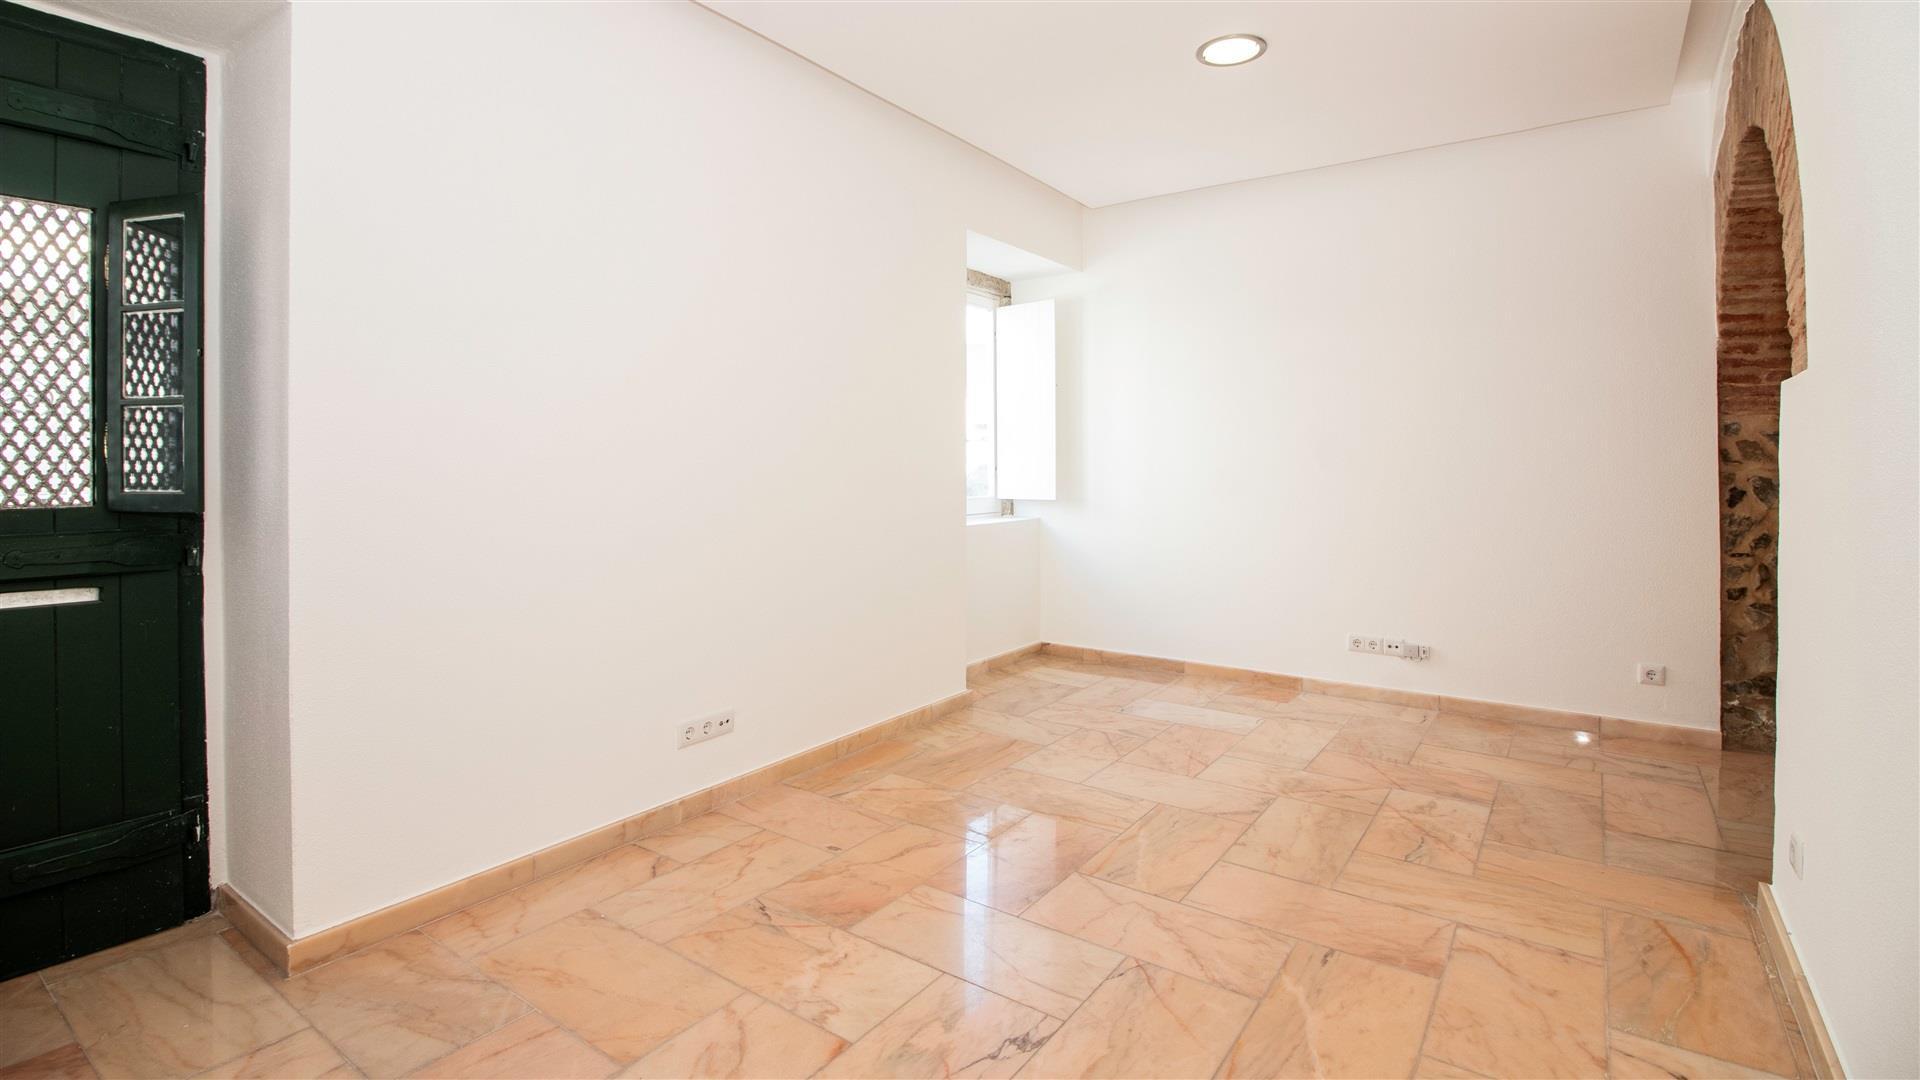 Andar Moradia T1 para comprar - Algarve, Vila Real de Santo António, Vila Real de Santo António